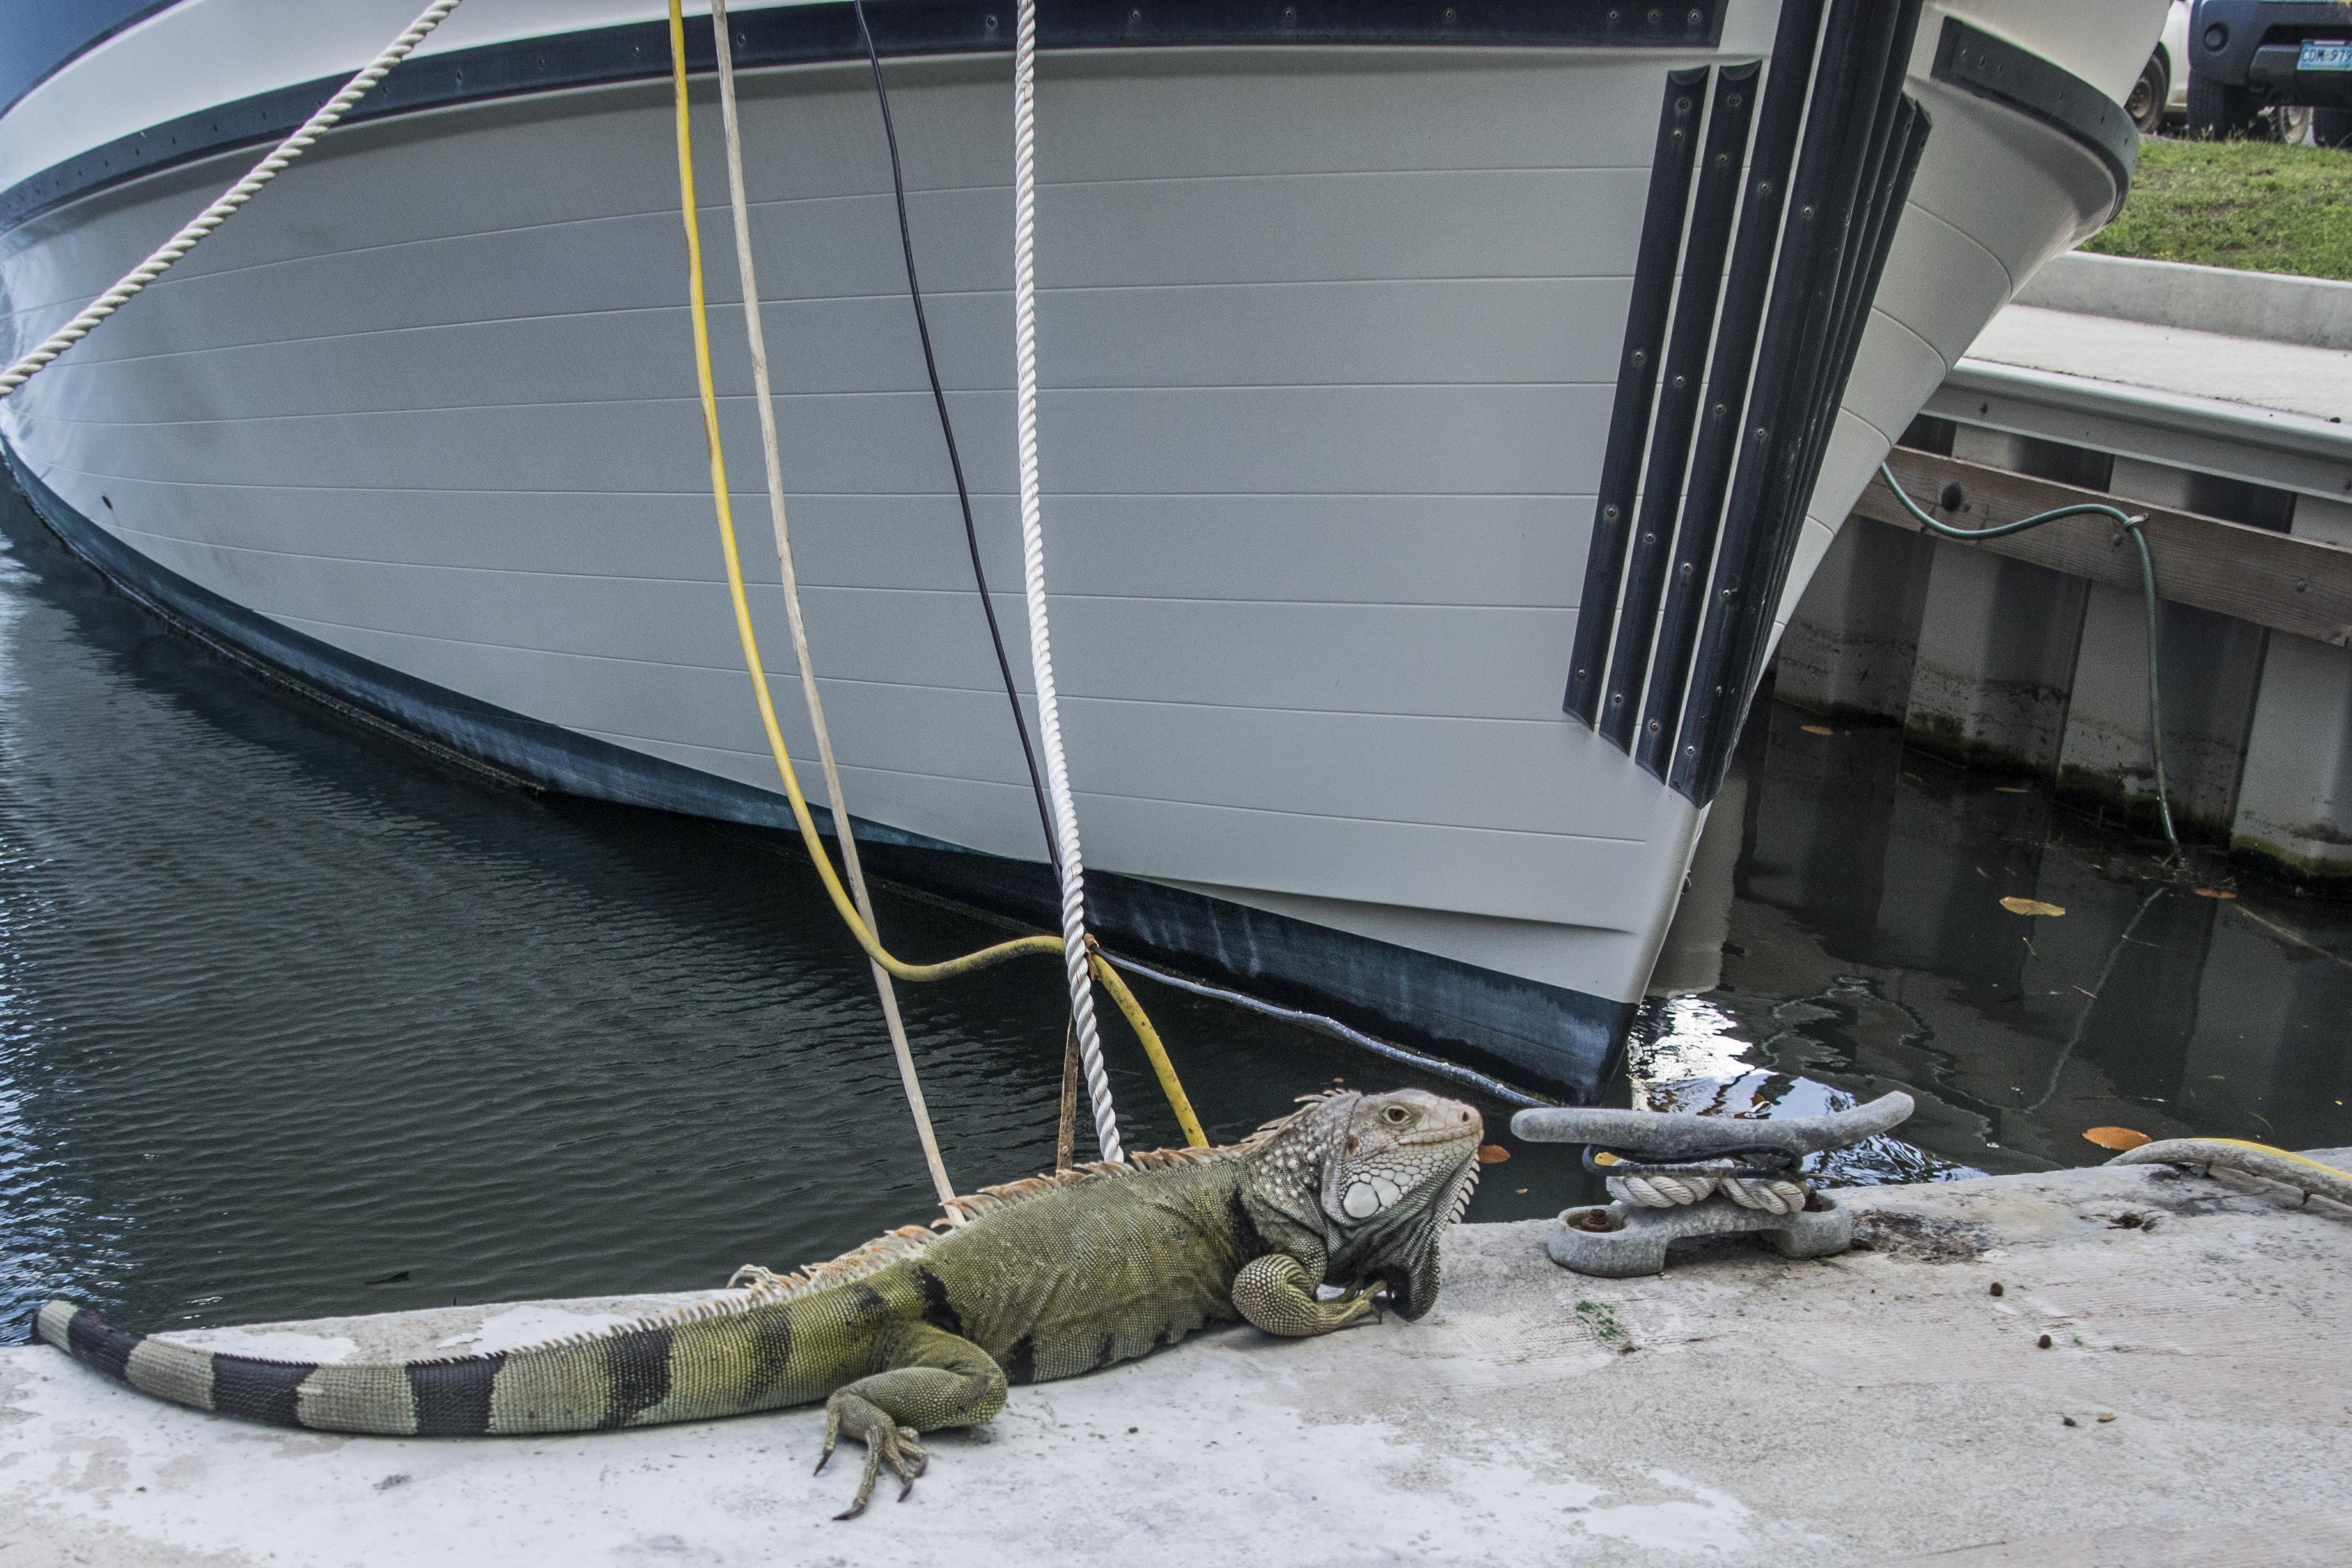 Gaurding the dock